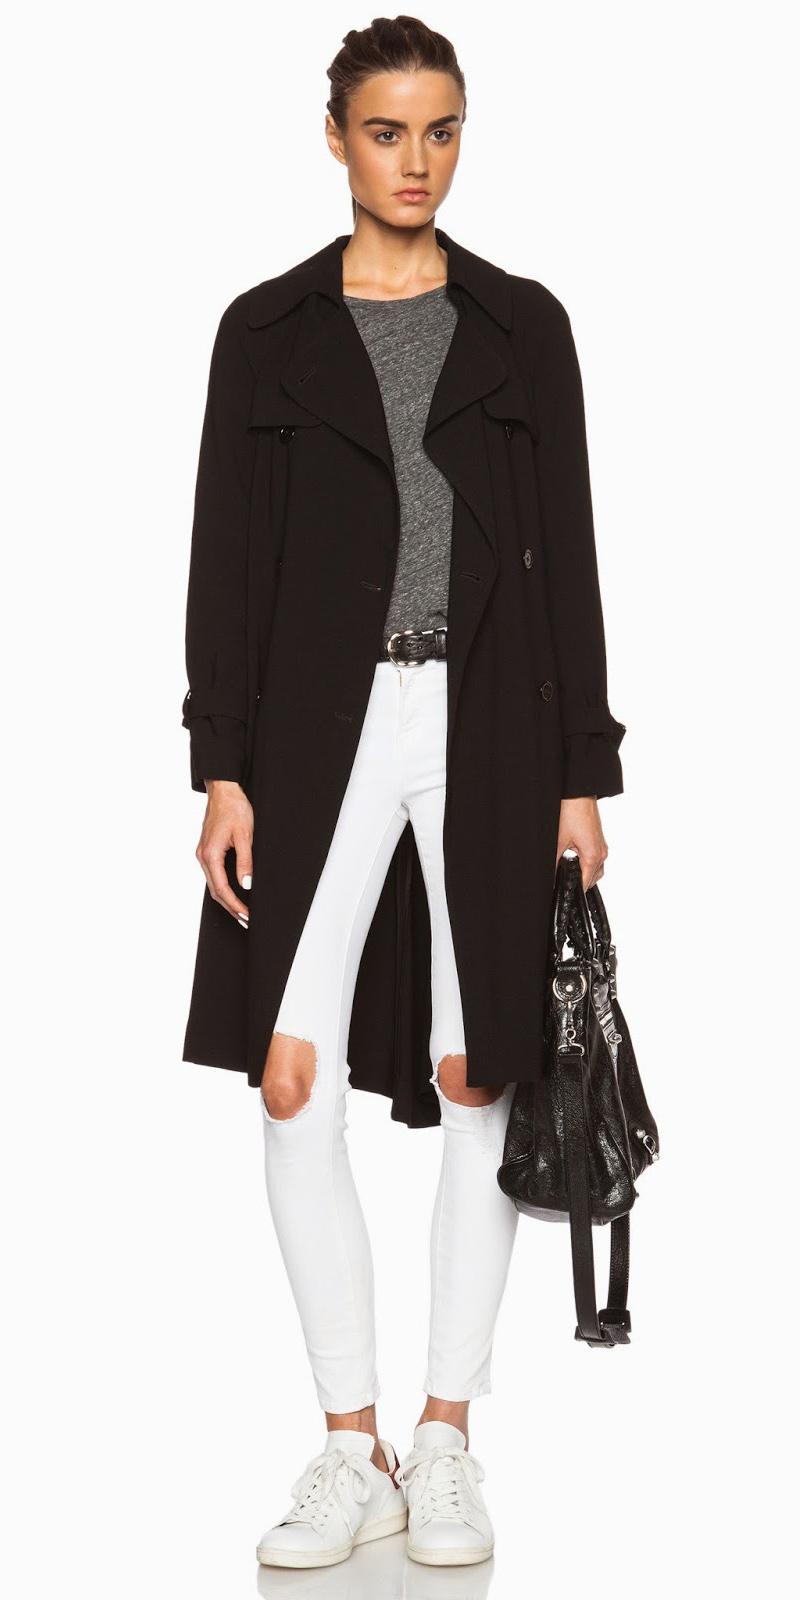 white-skinny-jeans-grayd-tee-belt-hairr-black-jacket-coat-trench-white-shoe-sneakers-black-bag-fall-winter-weekend.jpg